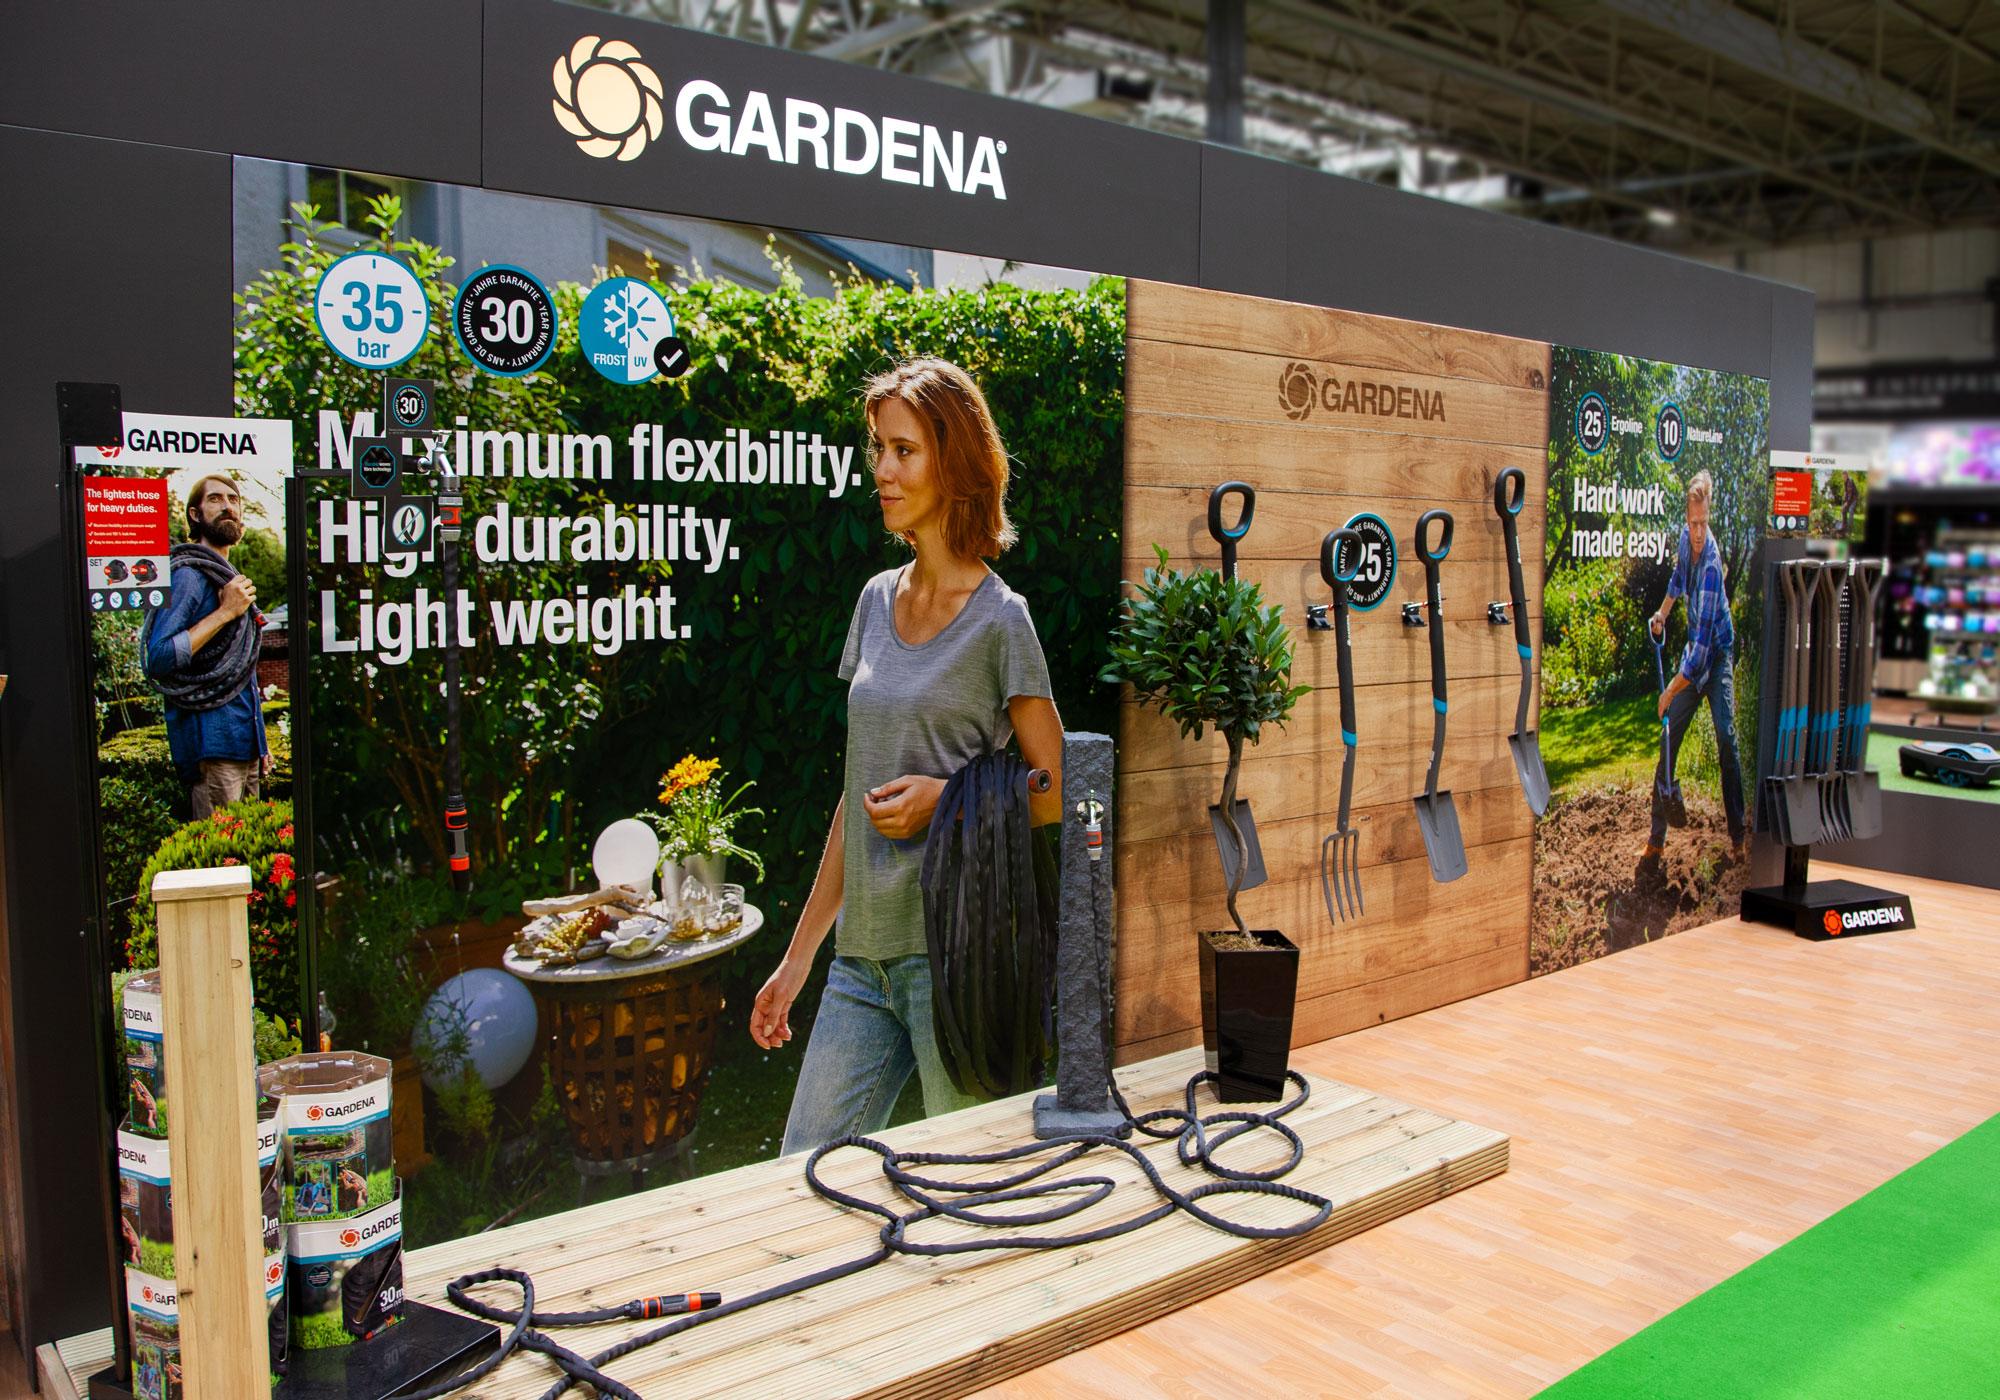 Gardena at GLEE exhibition